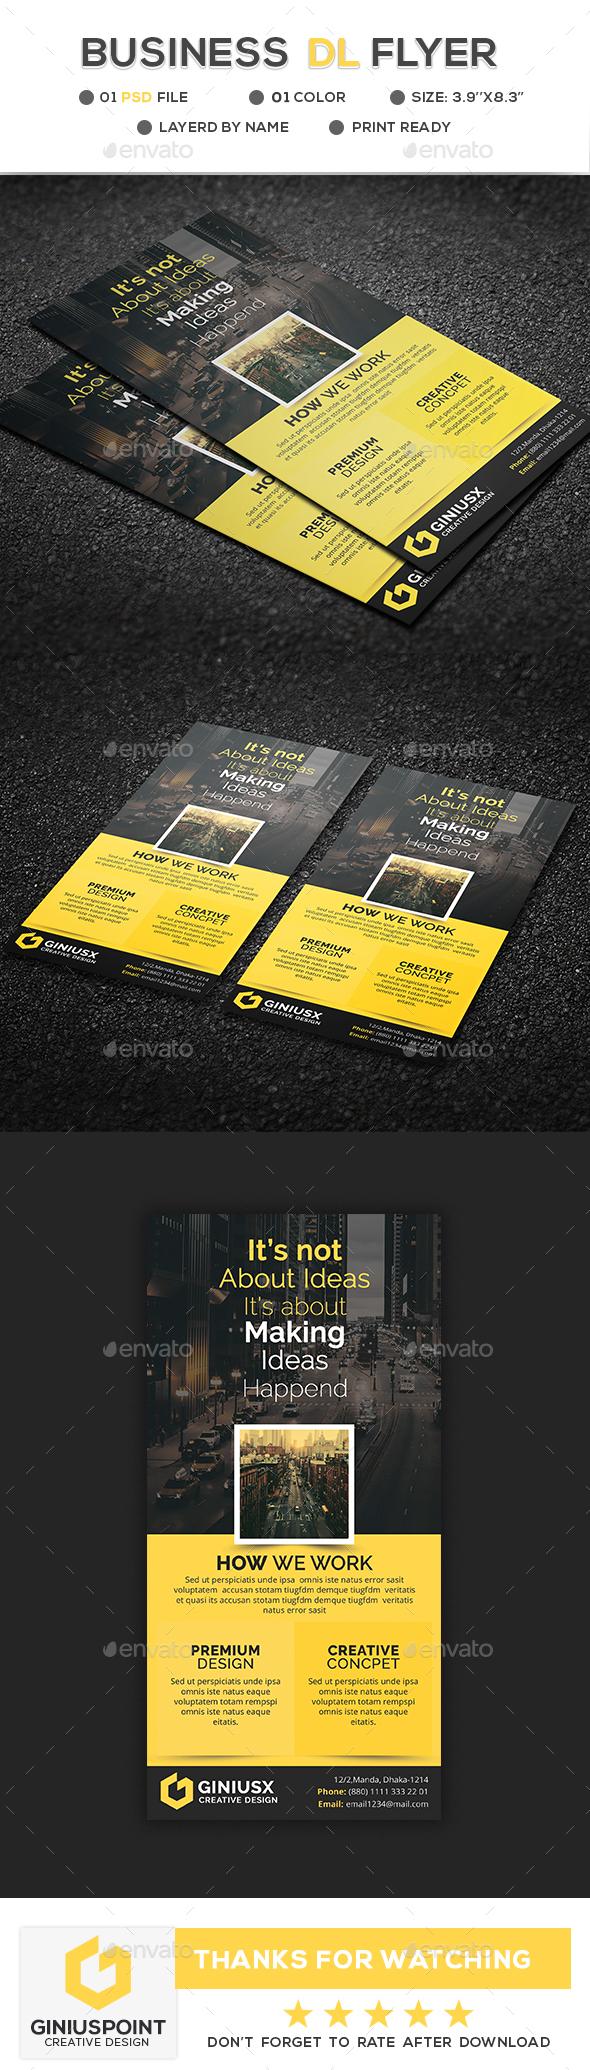 GraphicRiver Business DL-Flyer 20756921